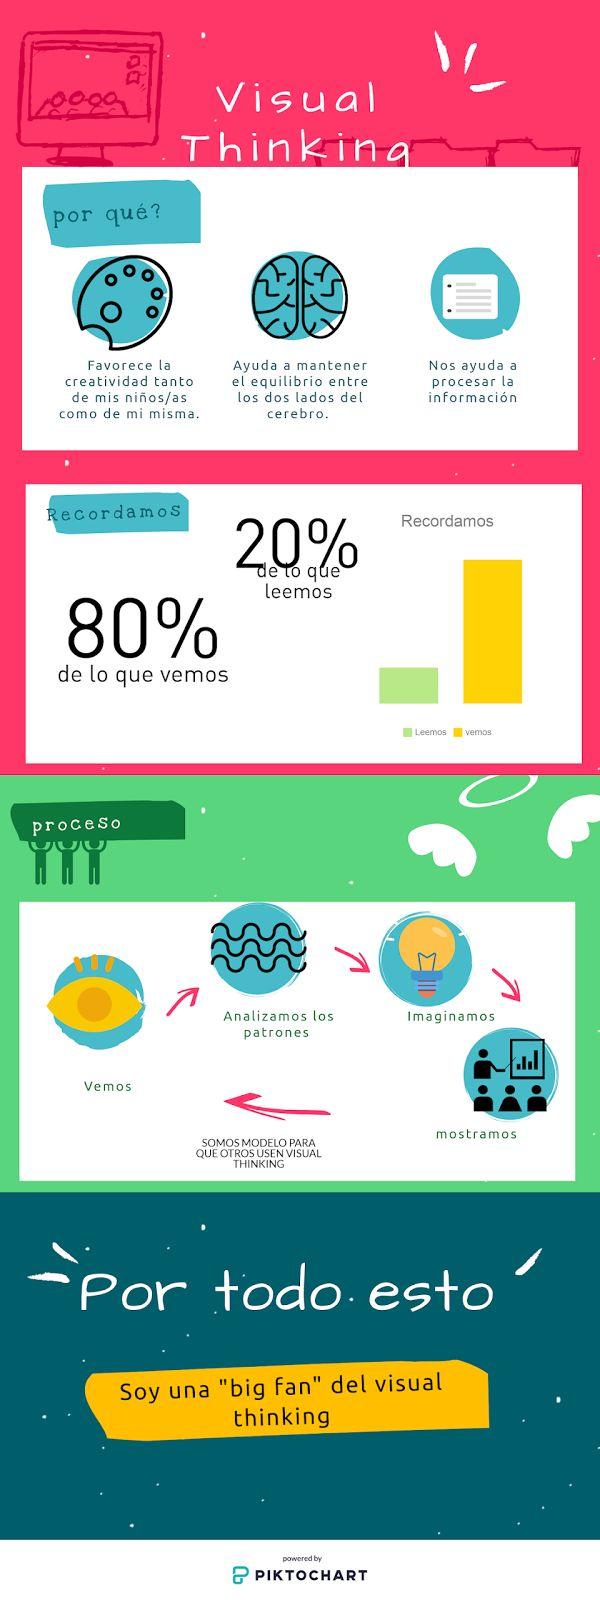 Infografía sobre VisualThinking de Silvia Peral